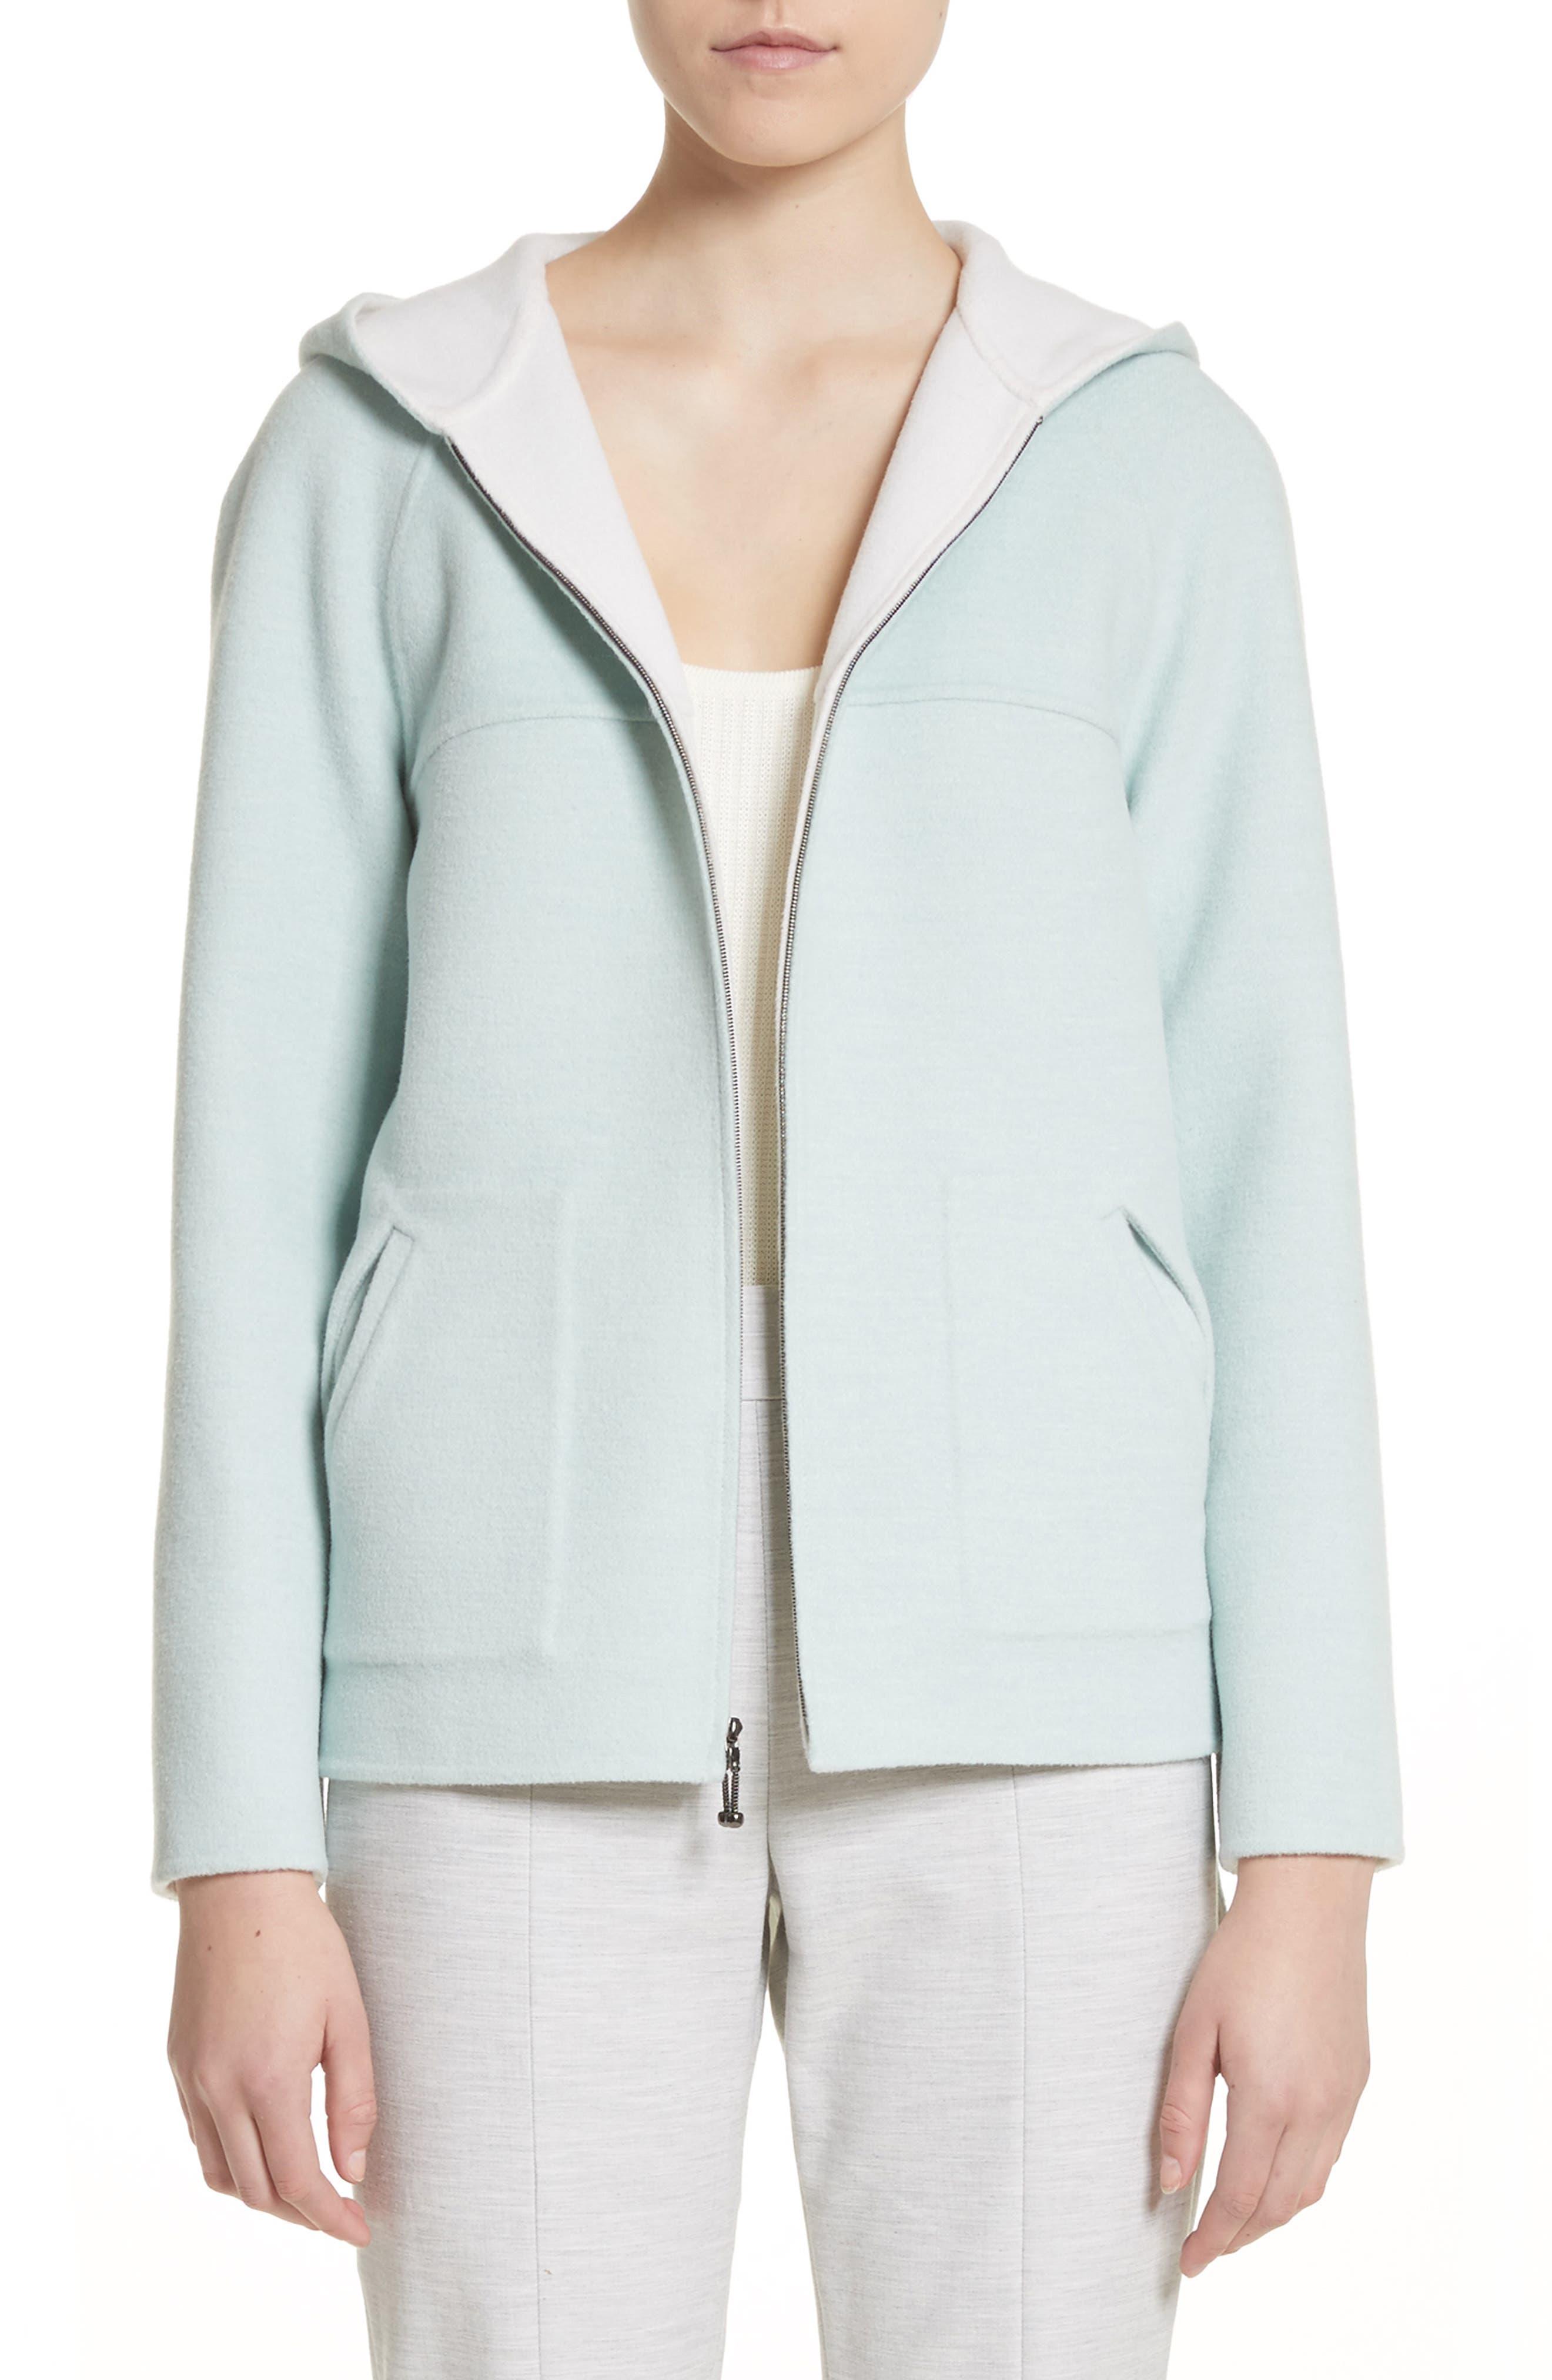 Reversible Wool & Angora Blend Sweatshirt,                             Main thumbnail 1, color,                             Mint/ Frost